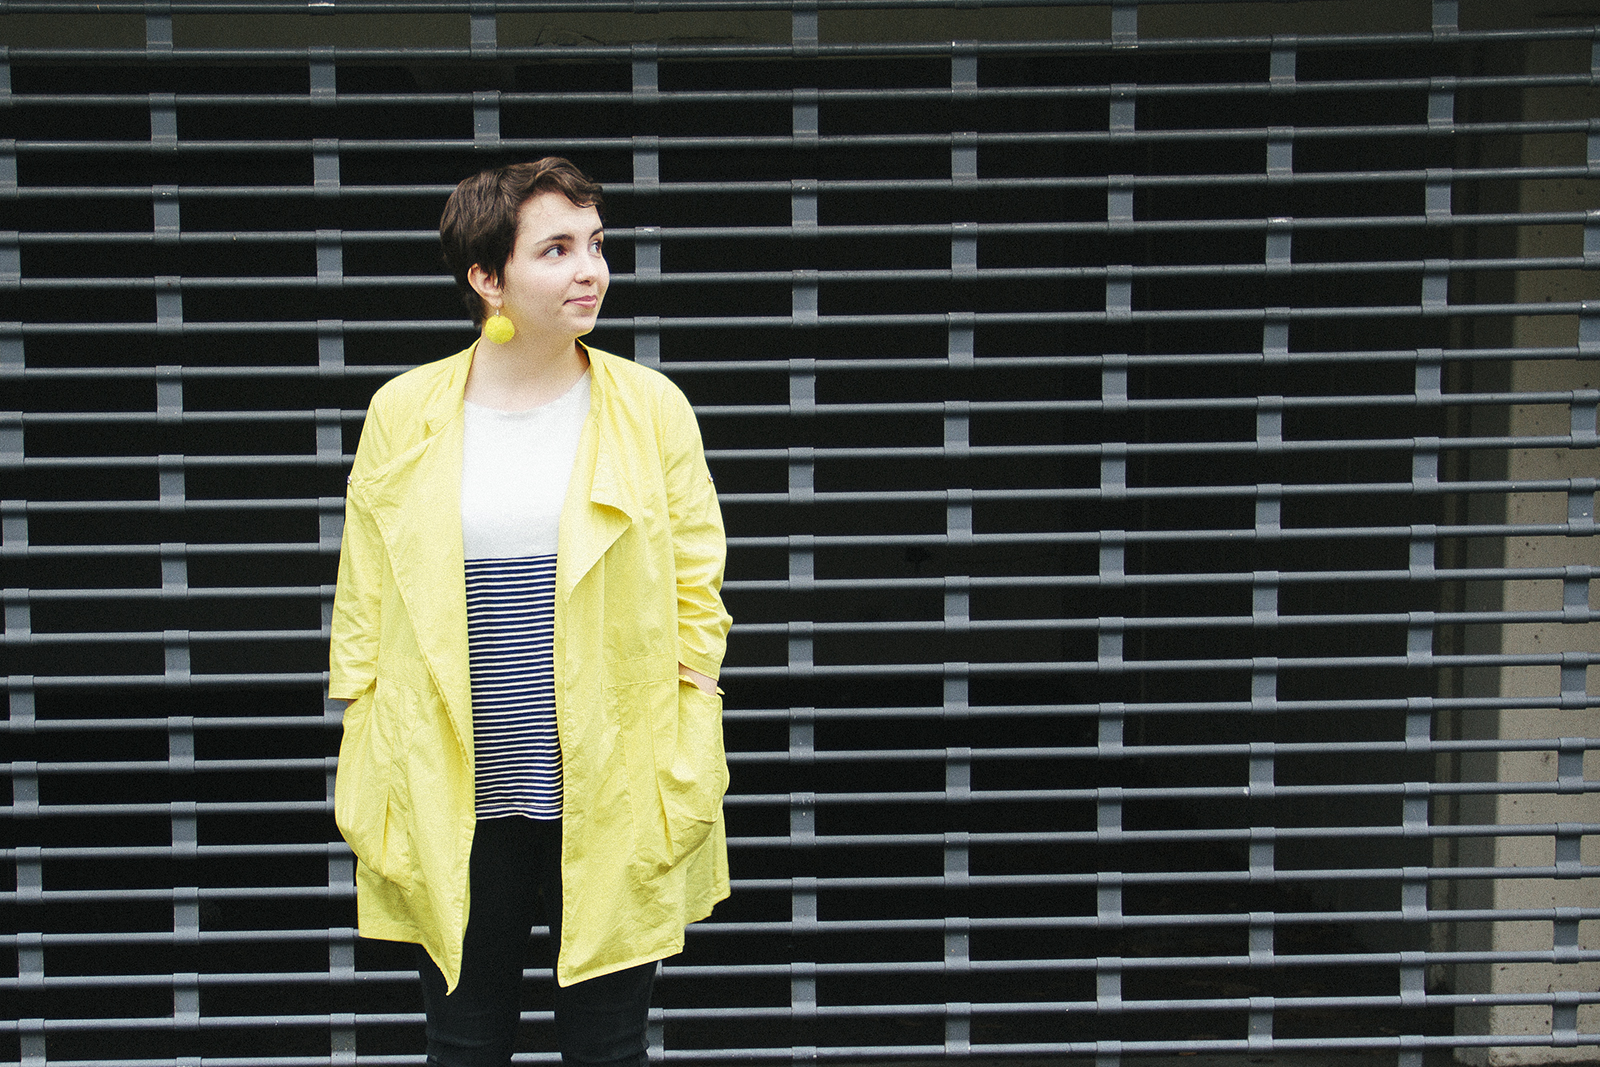 Meet Louse Hutt, a New Zealand Filmmaker and founder of Online Heroines (www.onlineheroines.com).